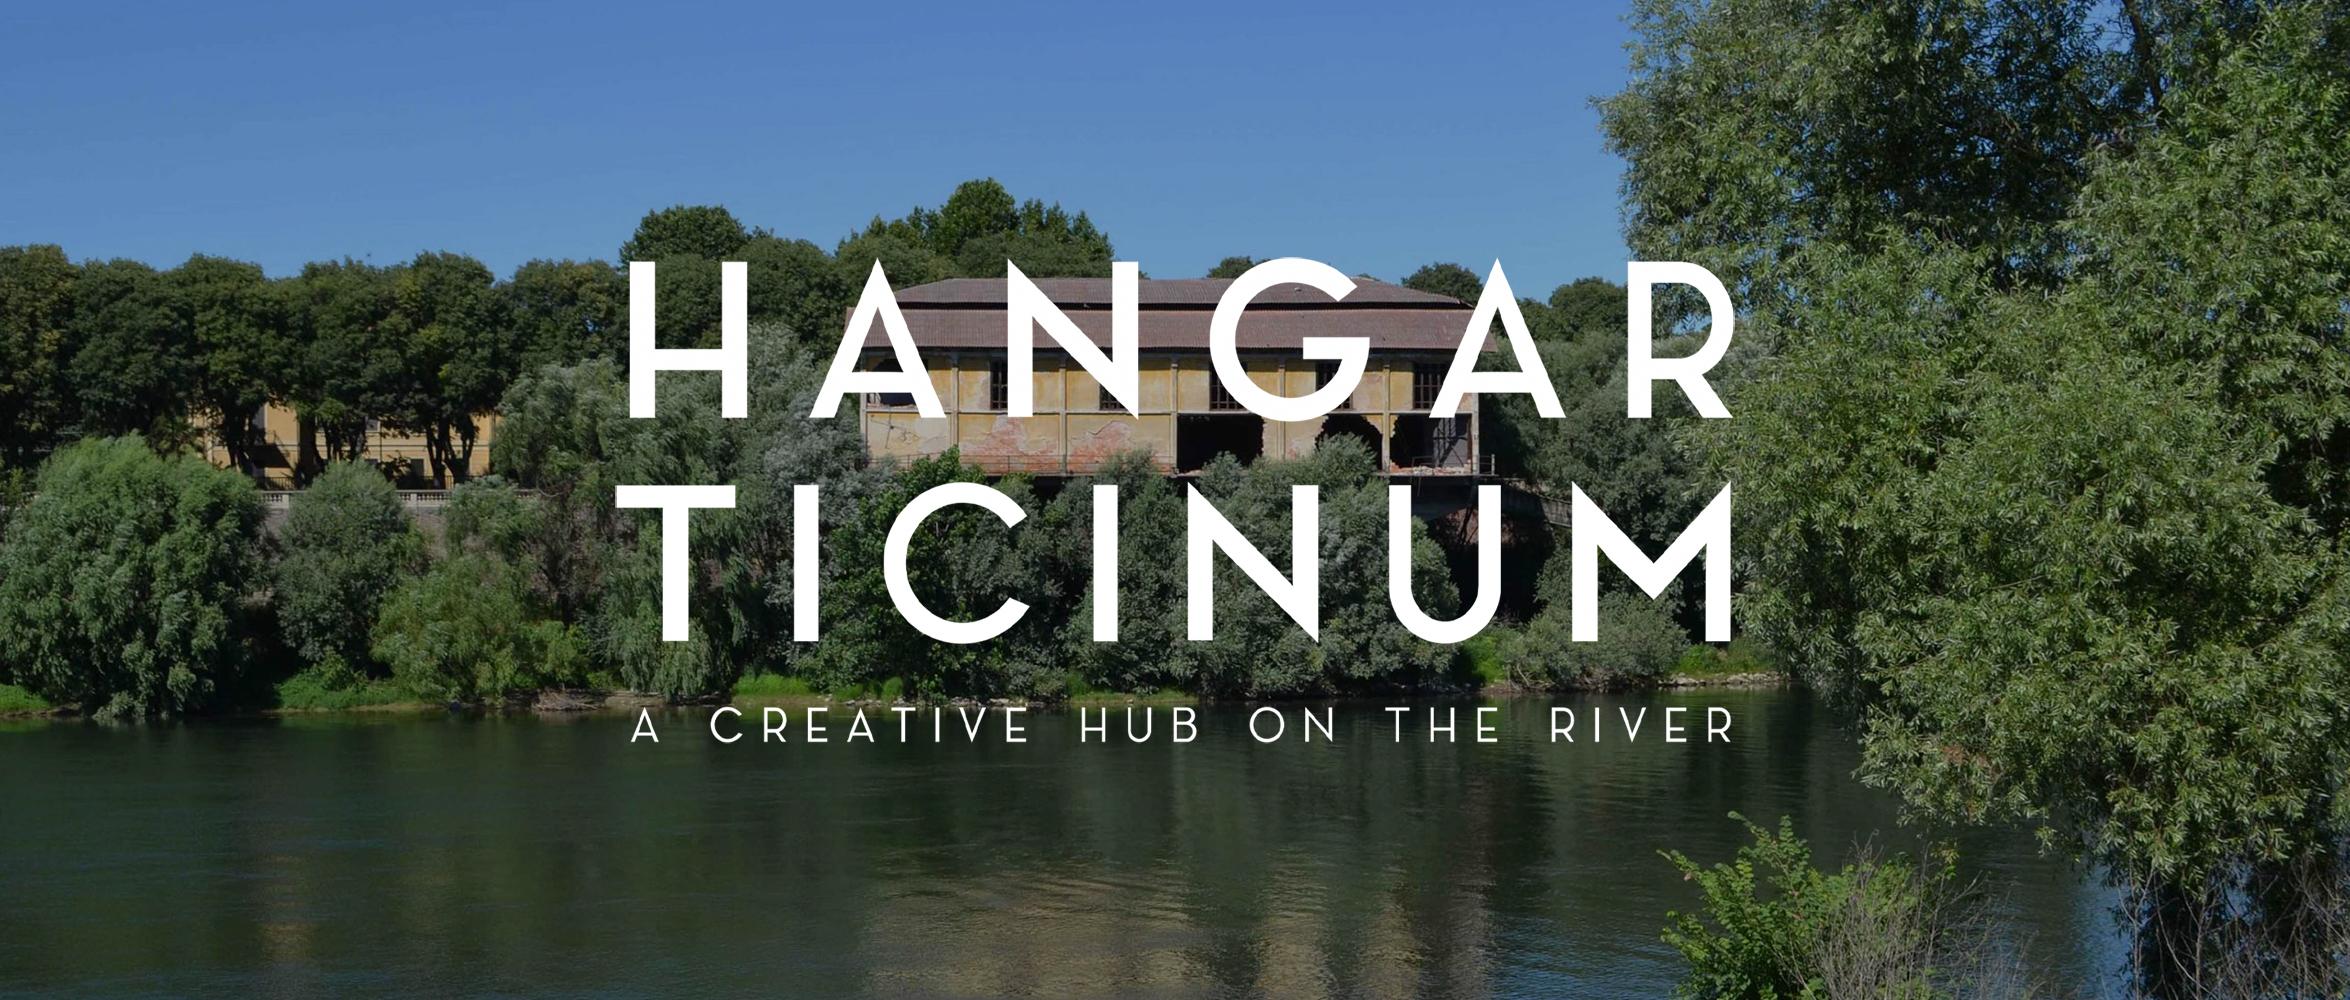 Hangar Ticinum——河上创意中心设计竞赛